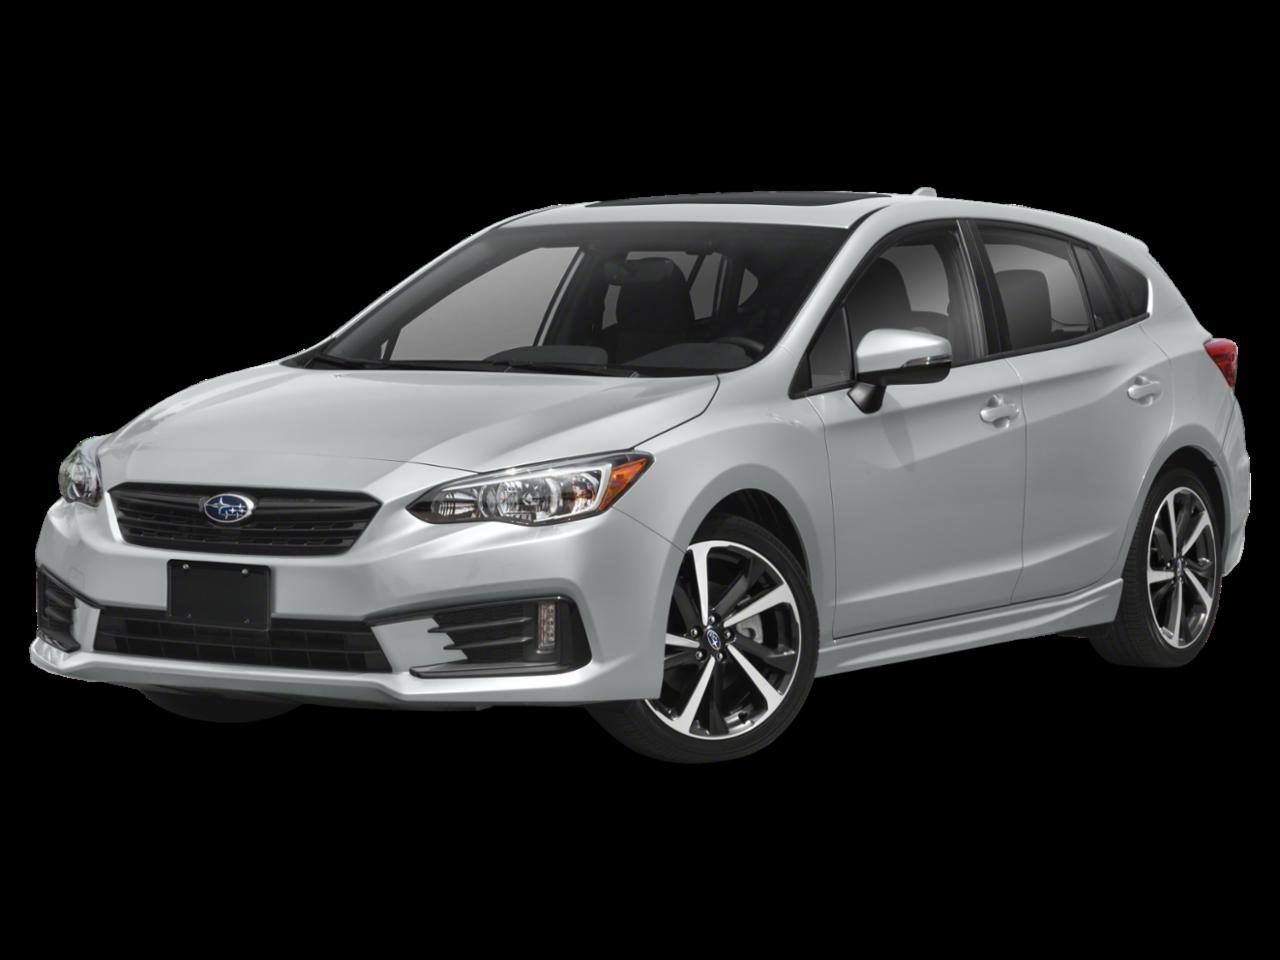 2020 Subaru Impreza Sport (CVT) Hatchback